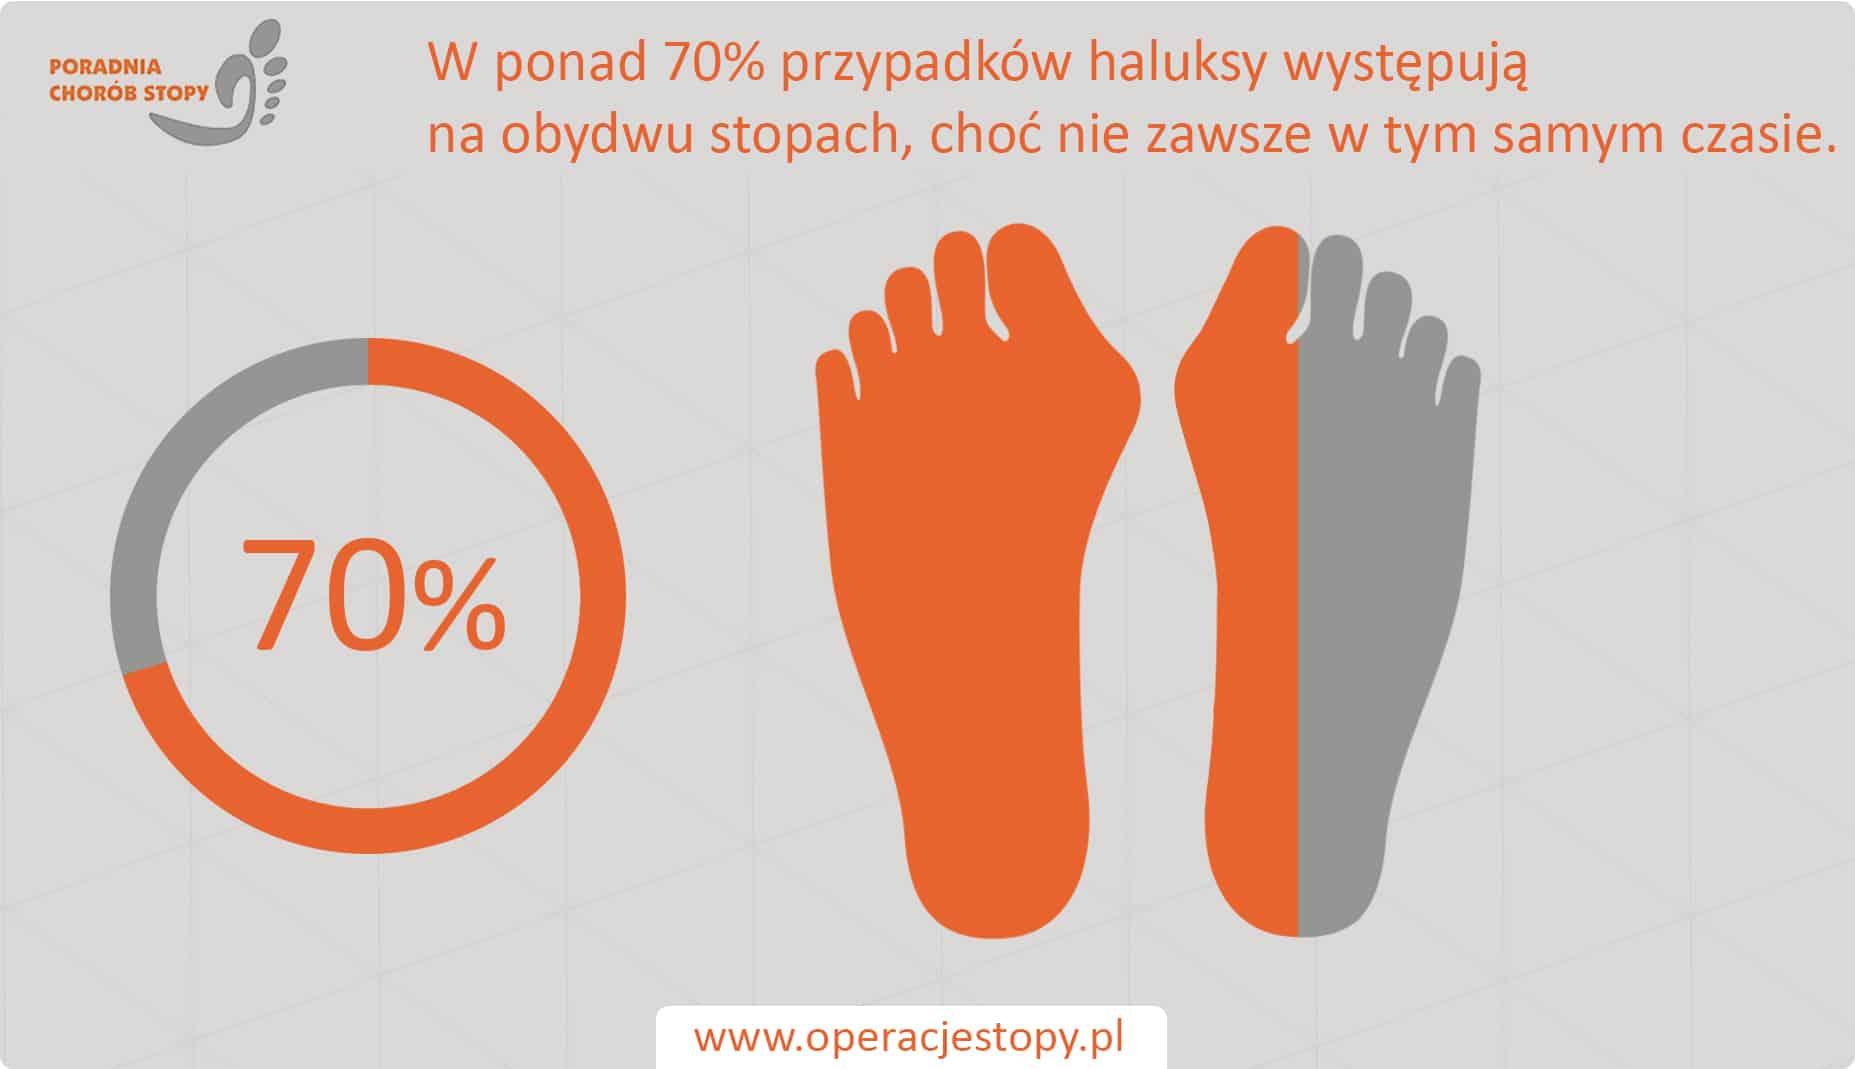 Operacjestopy.pl Haluksy - obydwie stopy